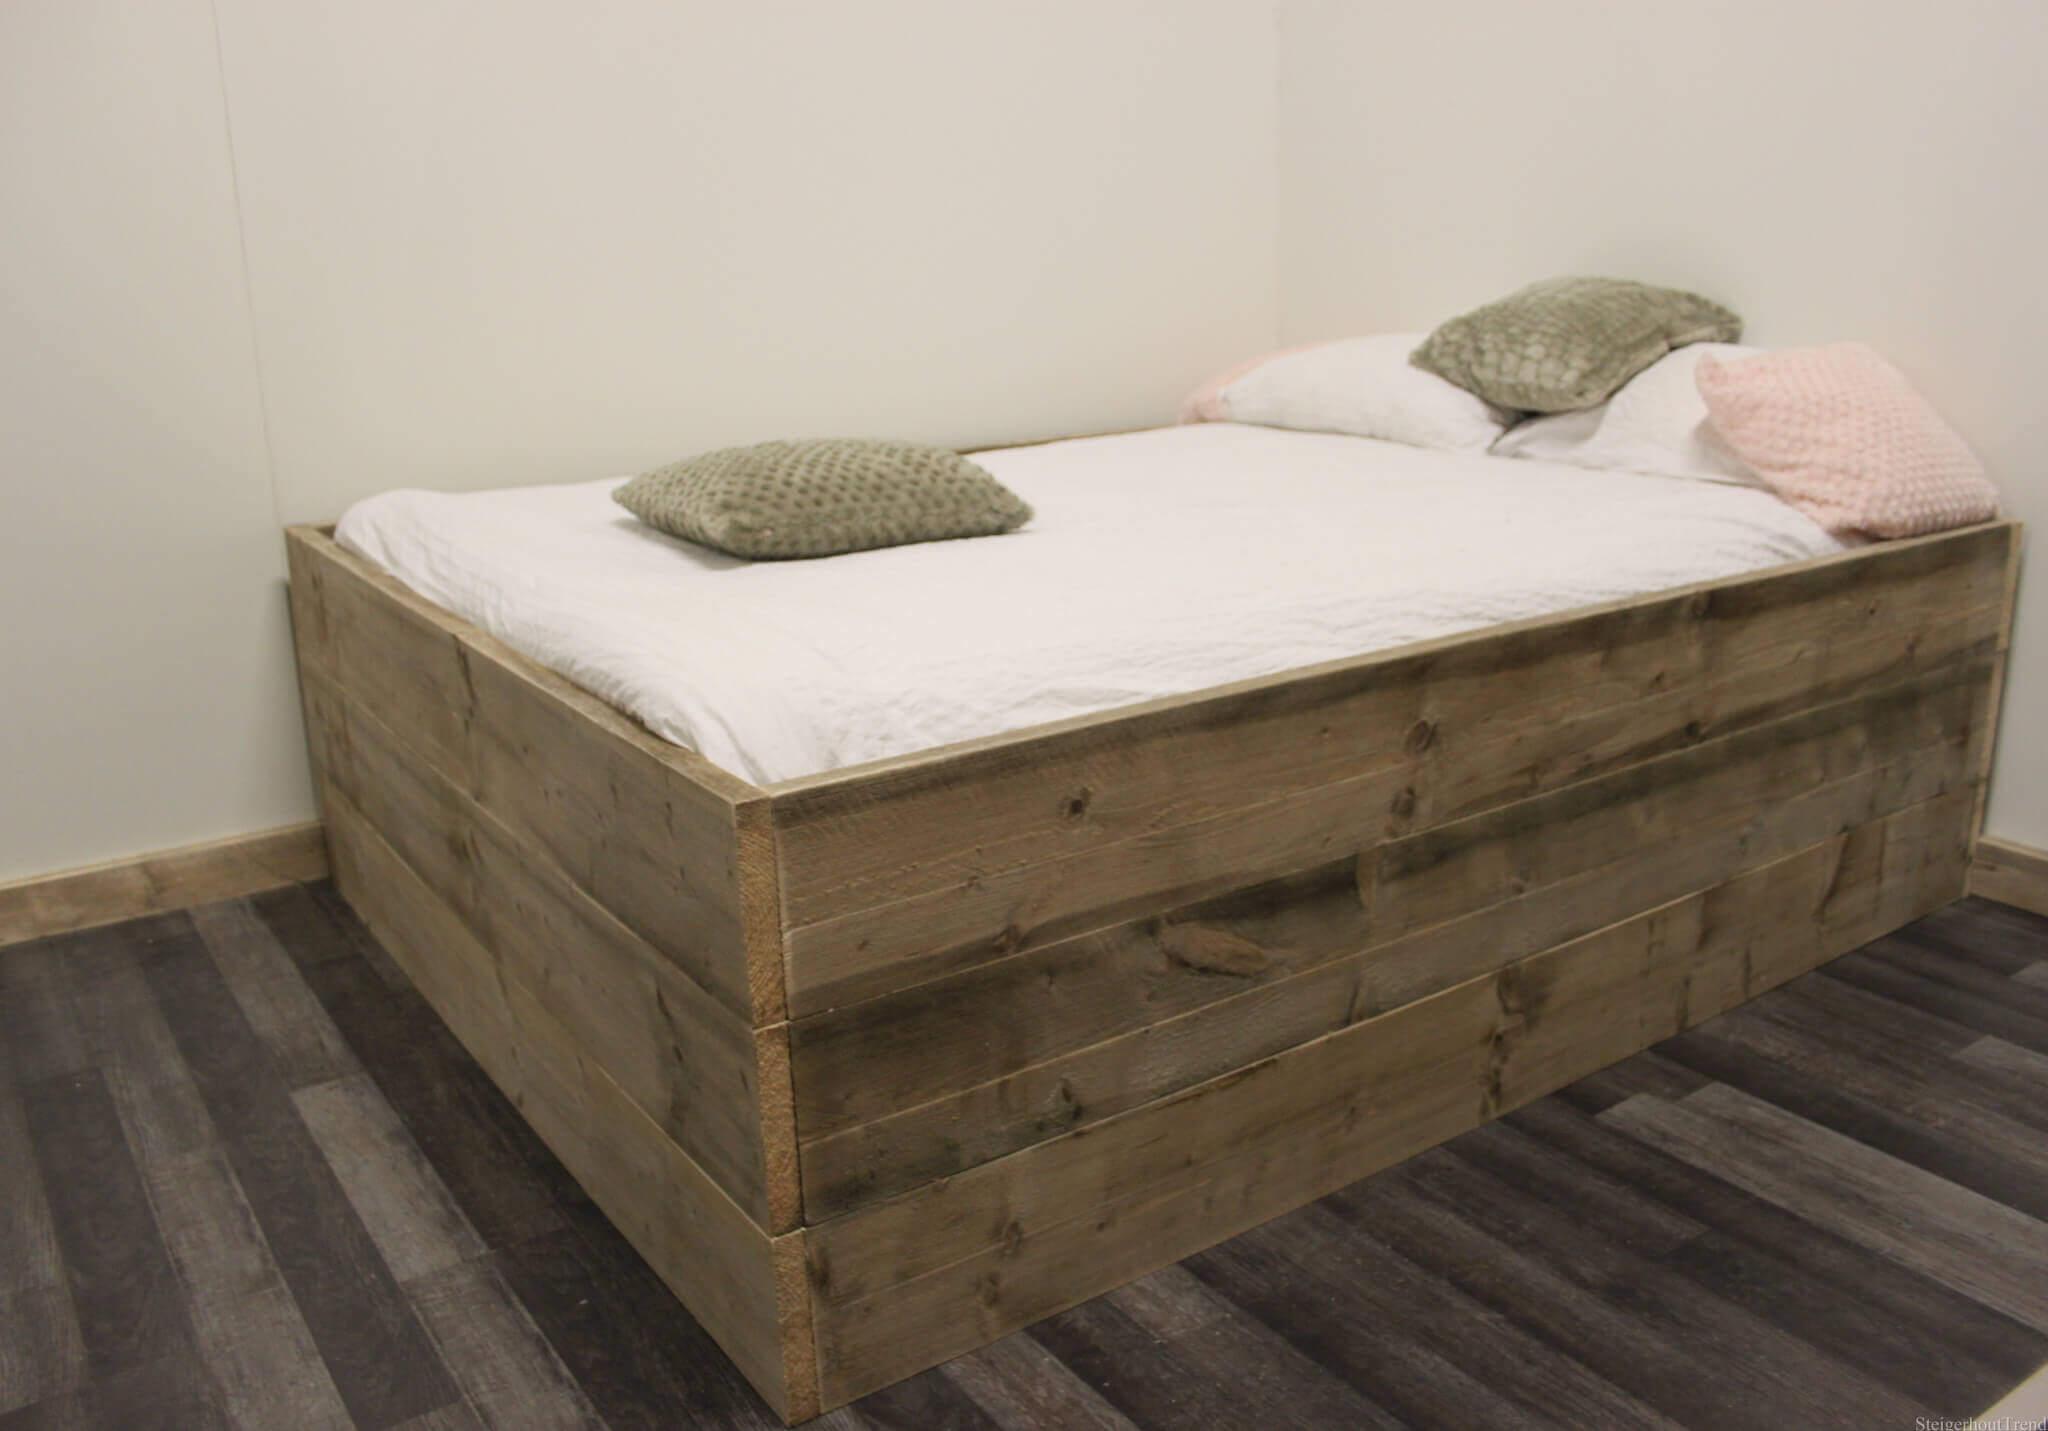 Steigerhouten bed odessa steigerhouttrend for Bed van steigerhout maken